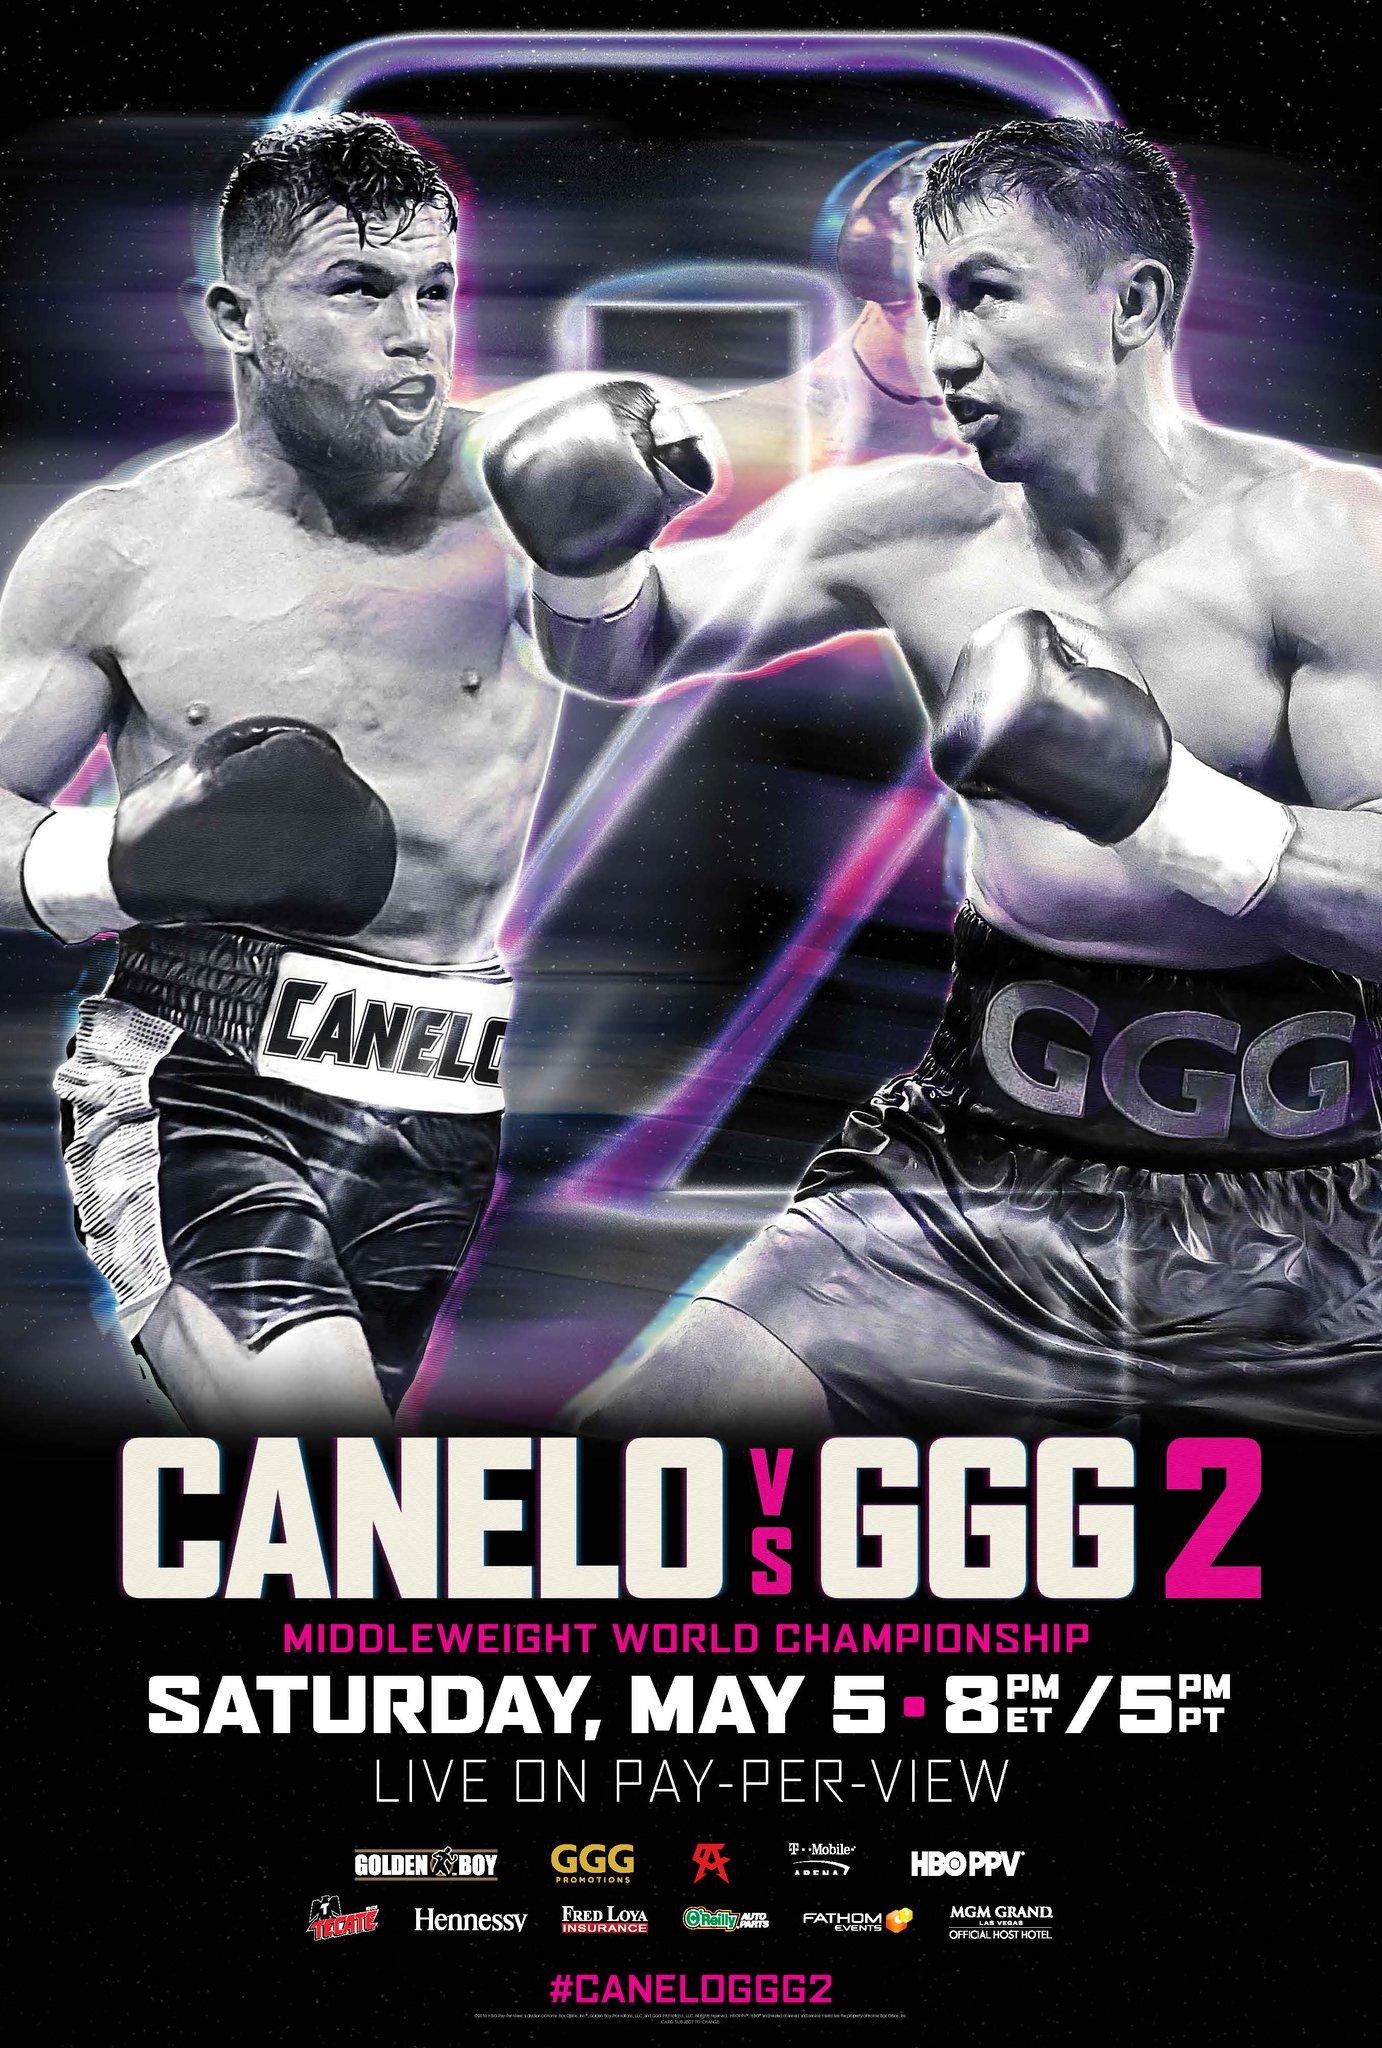 Canelo Alvarez vs. Gennady Golovkin II